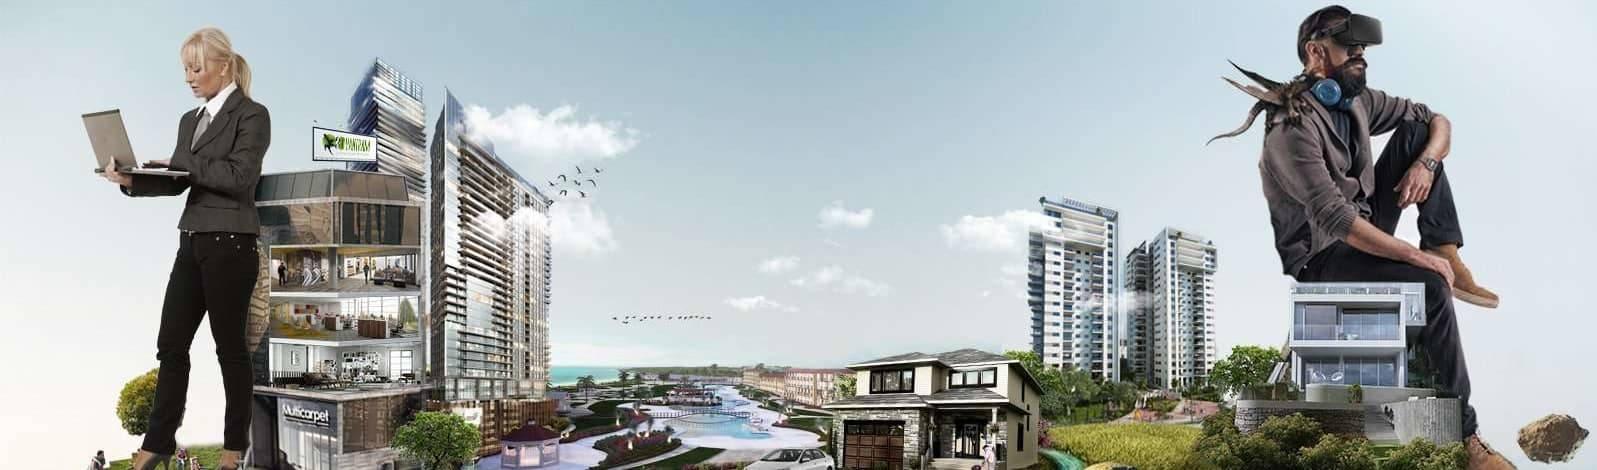 Yantram Architectural Animation Design Studio Corporation